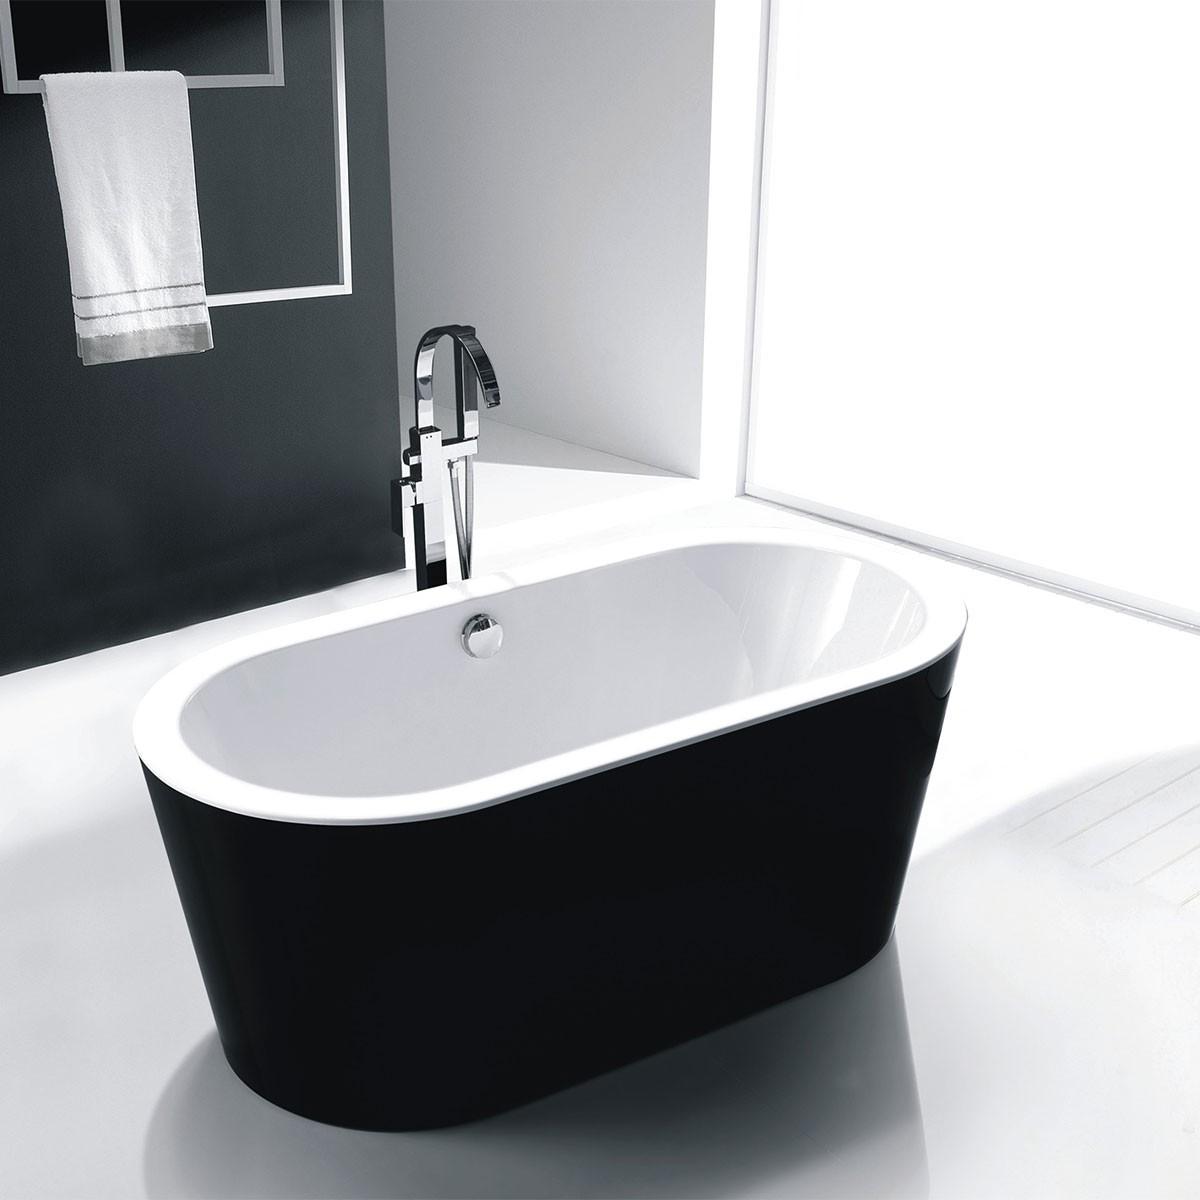 59 In Black Acrylic Freestanding Bathtub (DK-SLDYG858)